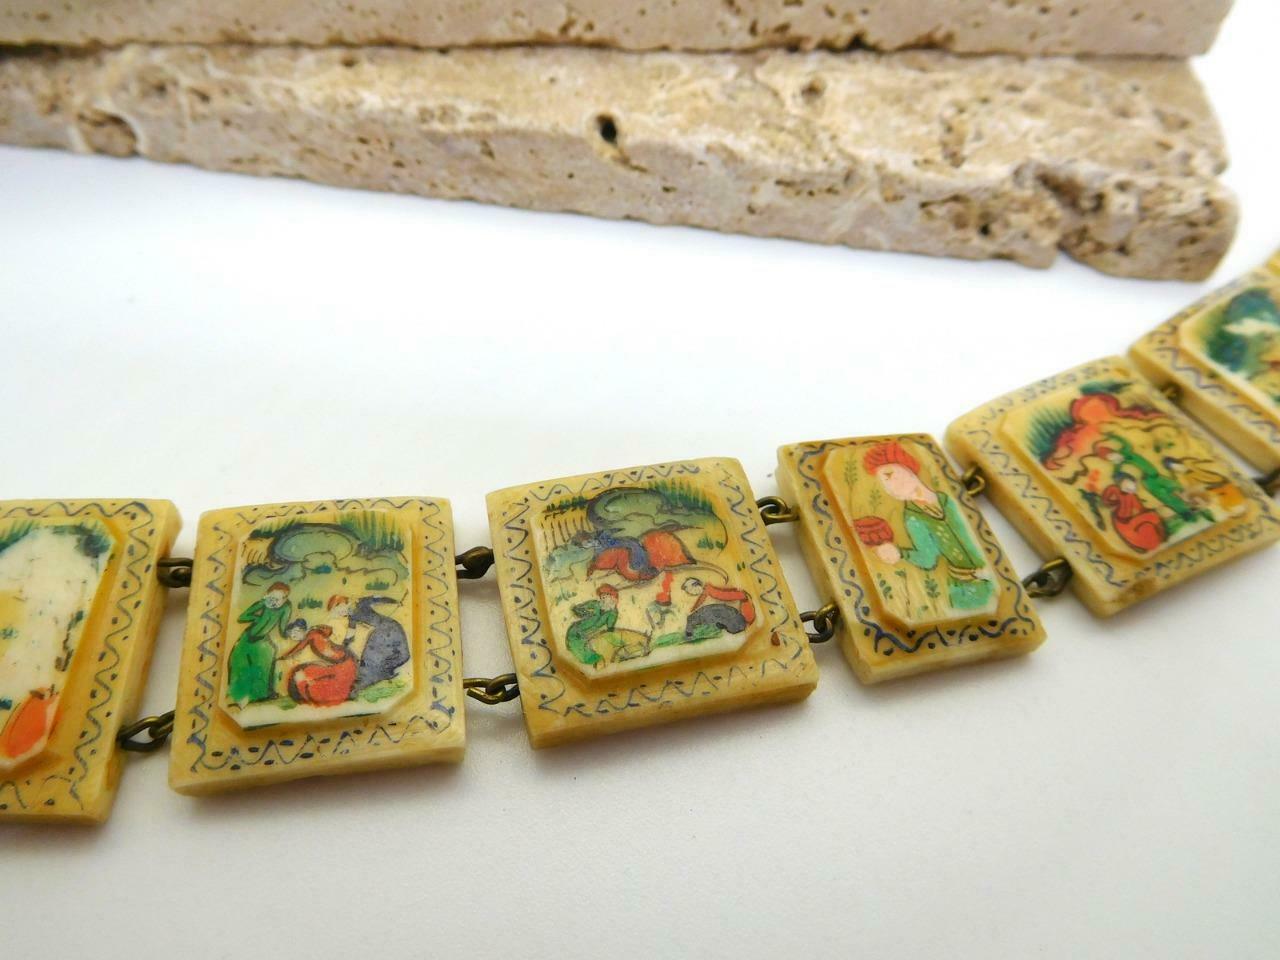 Vintage Hand Painted Oxen Bone Persian Story Panel Bracelet N24 image 2